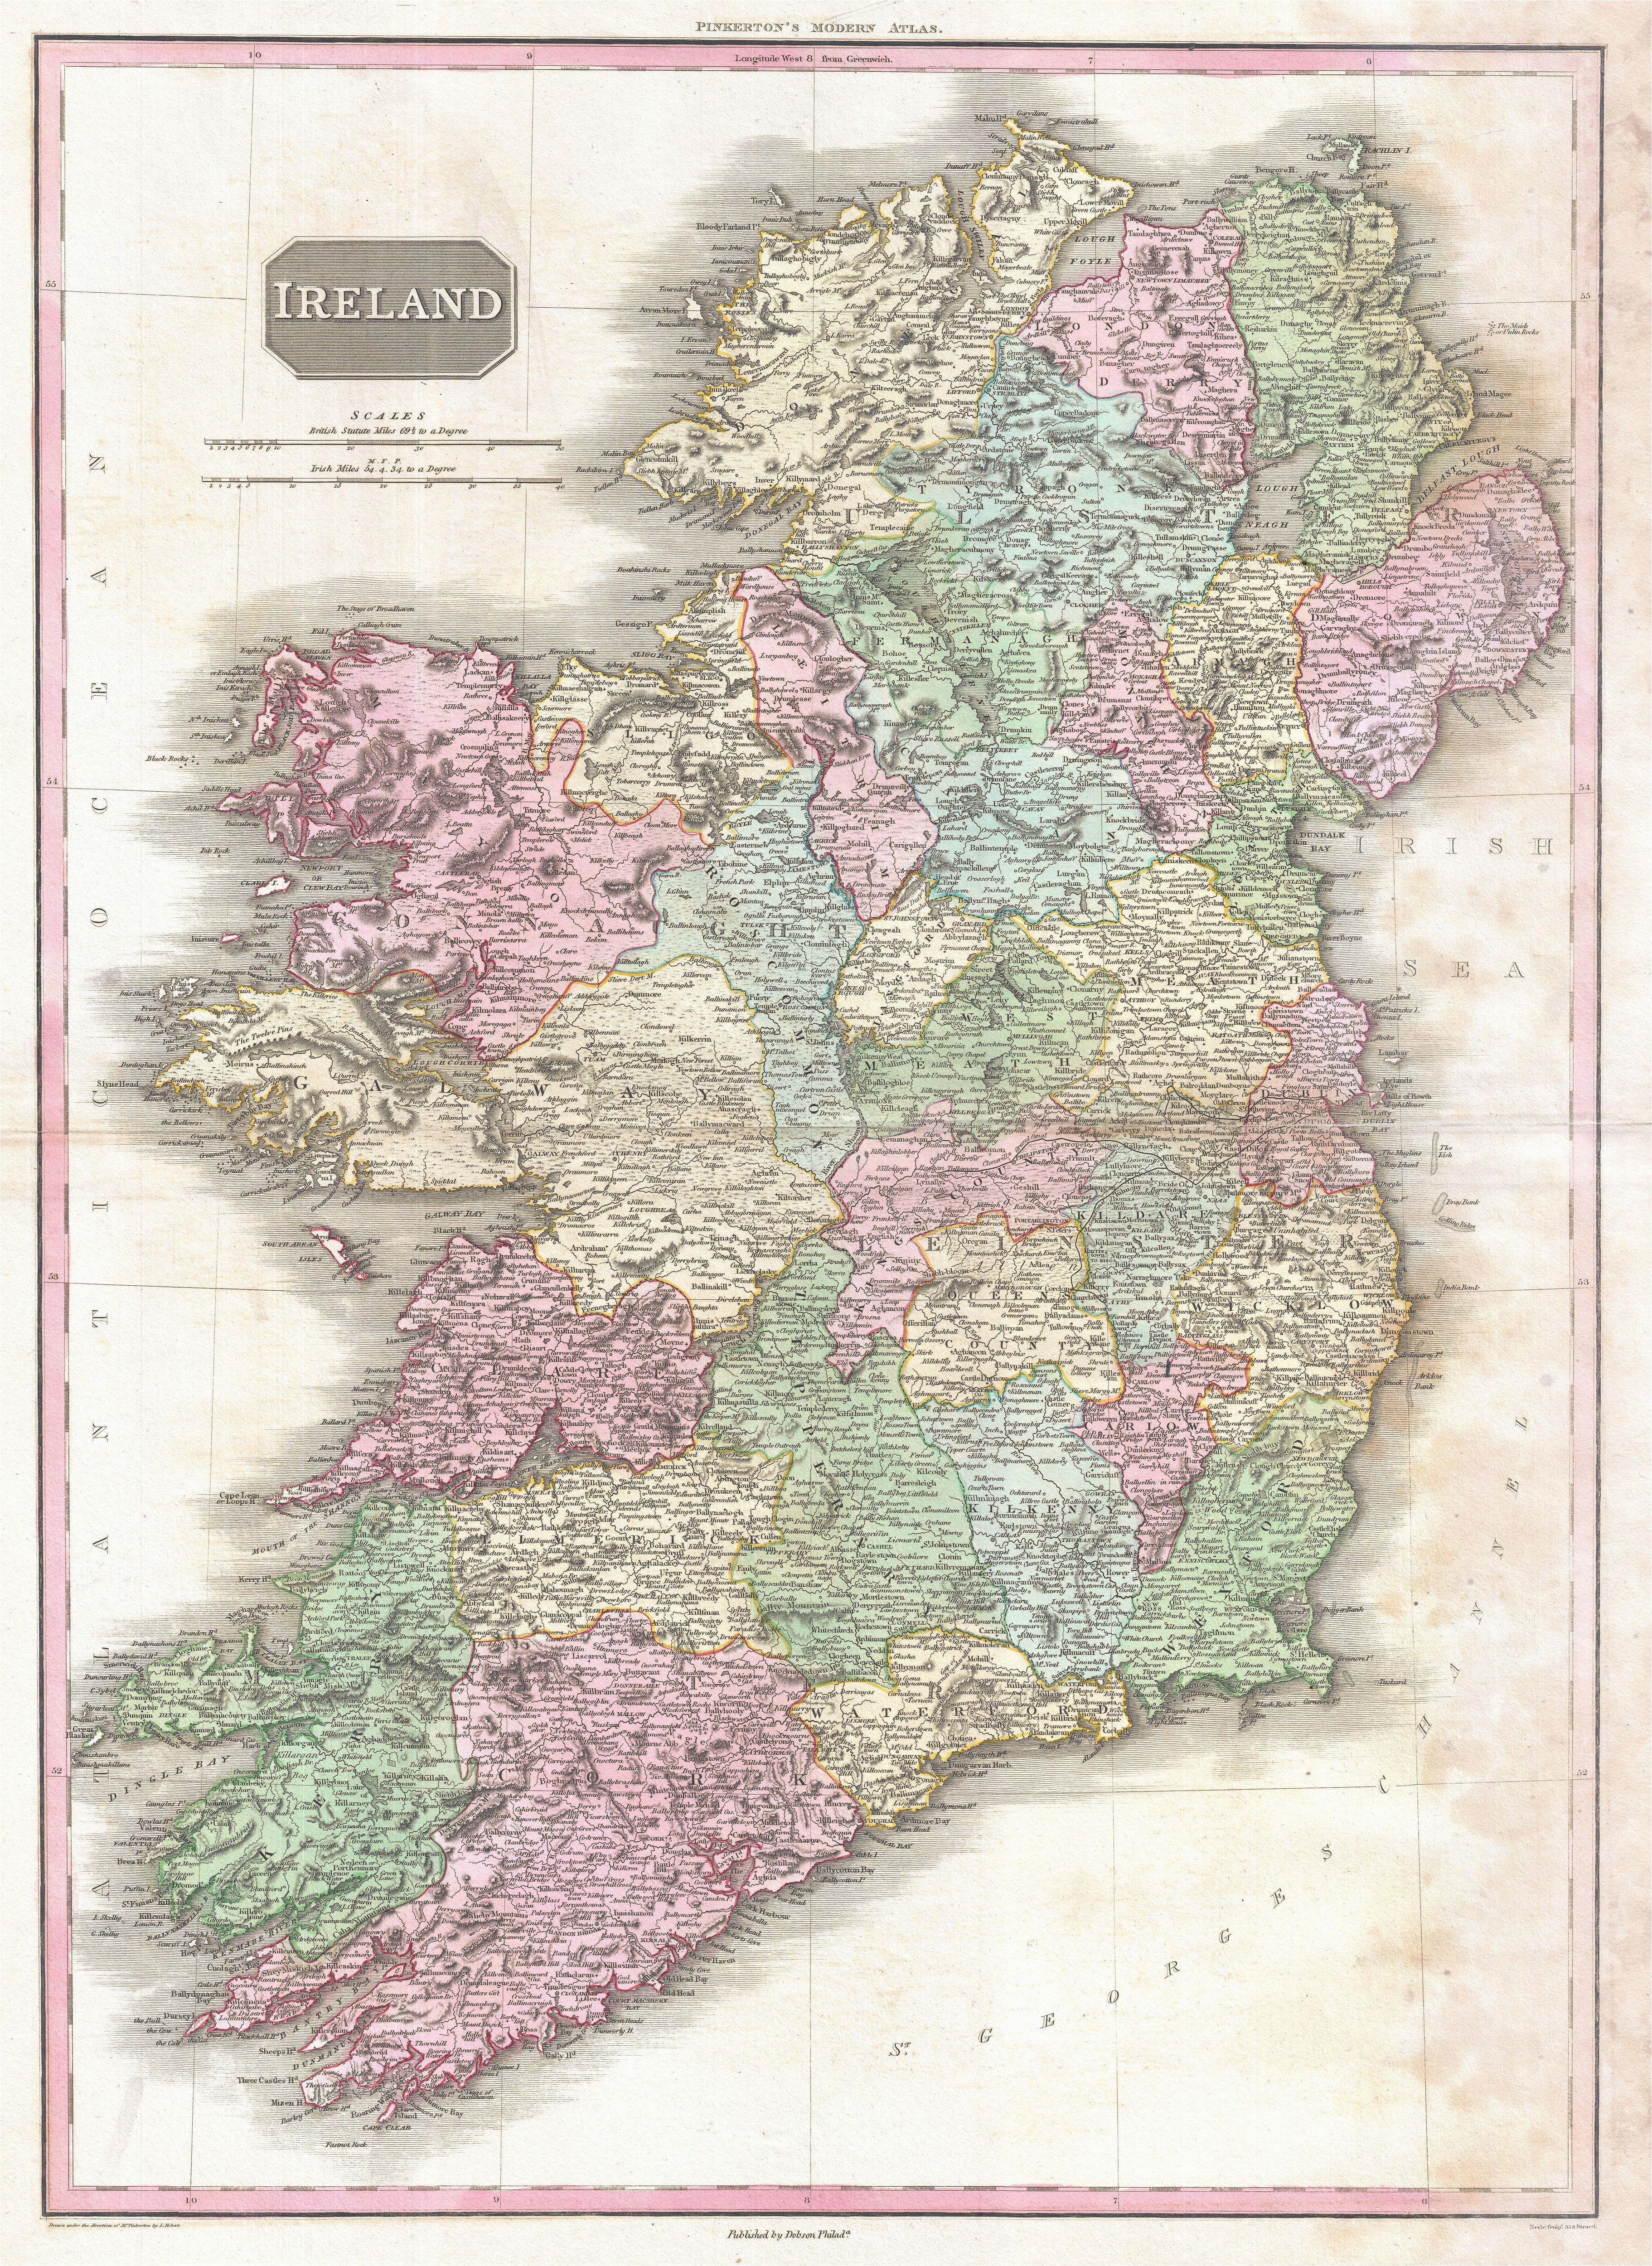 Map Od Ireland File 1818 Pinkerton Map Of Ireland Geographicus Ireland